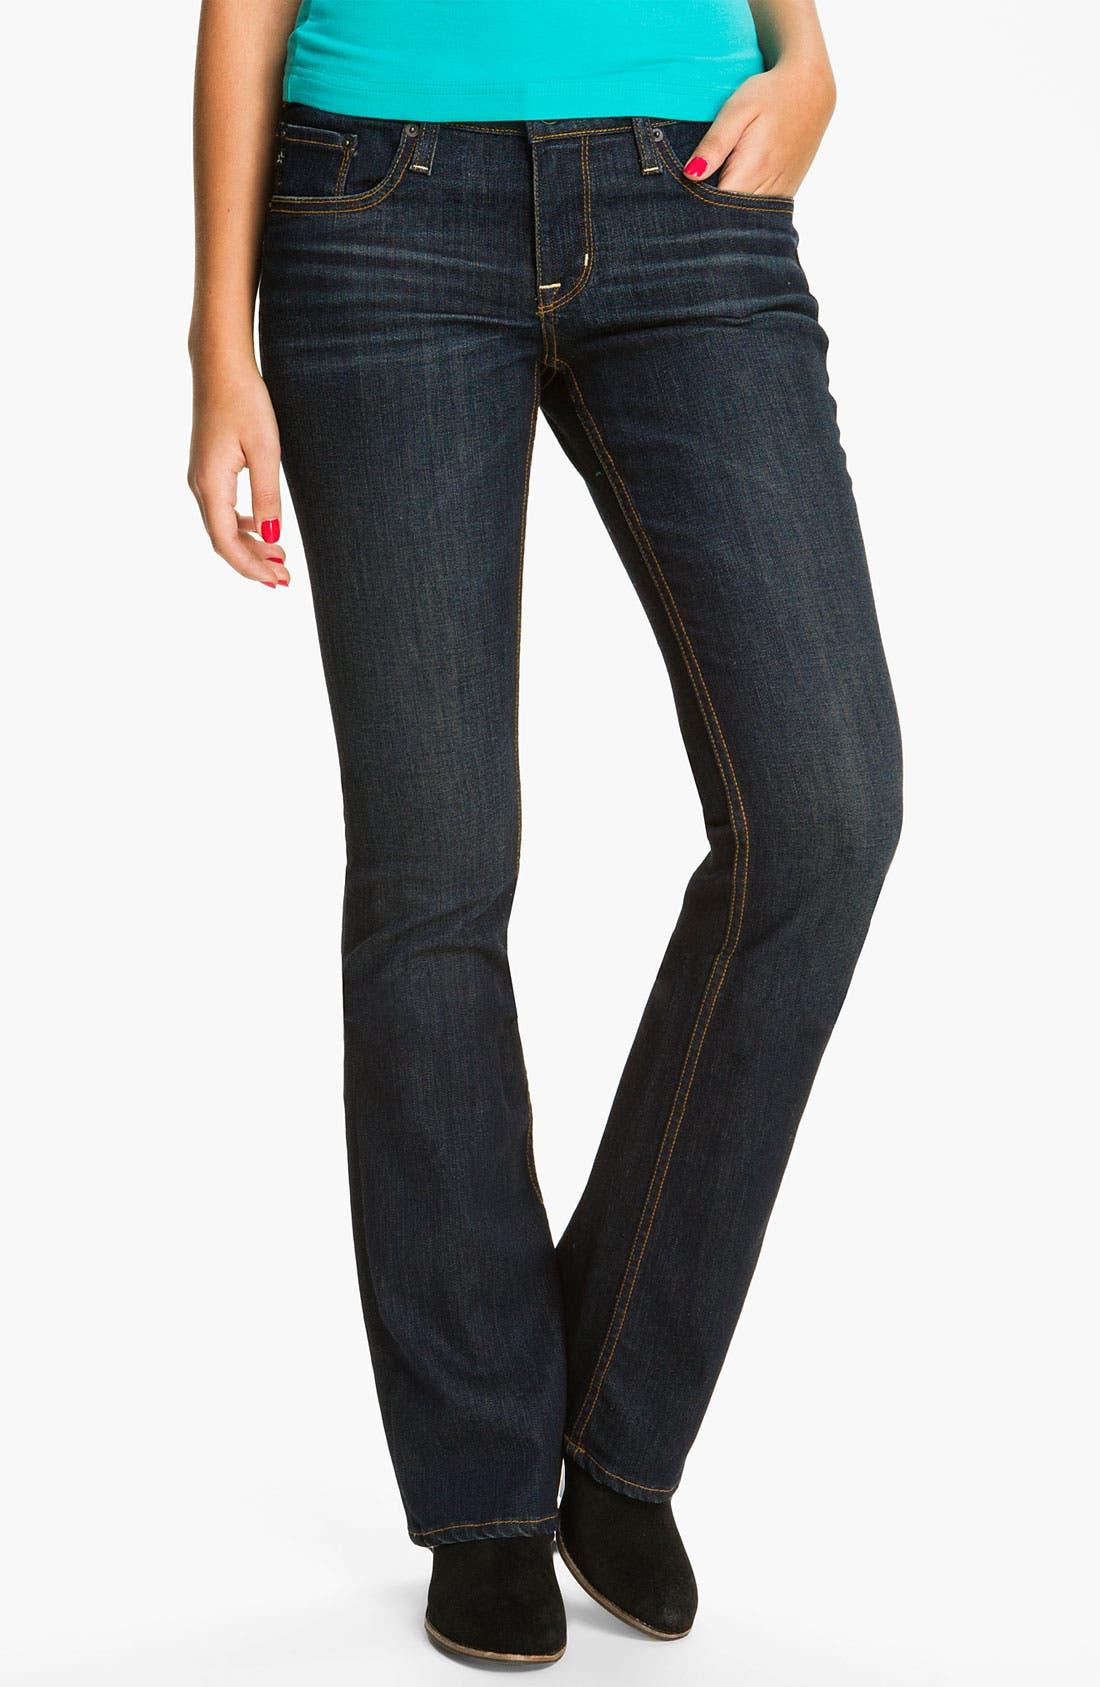 Main Image - Big Star 'Hazel' Slim Bootcut Jeans (Three Year Dust) (Juniors)